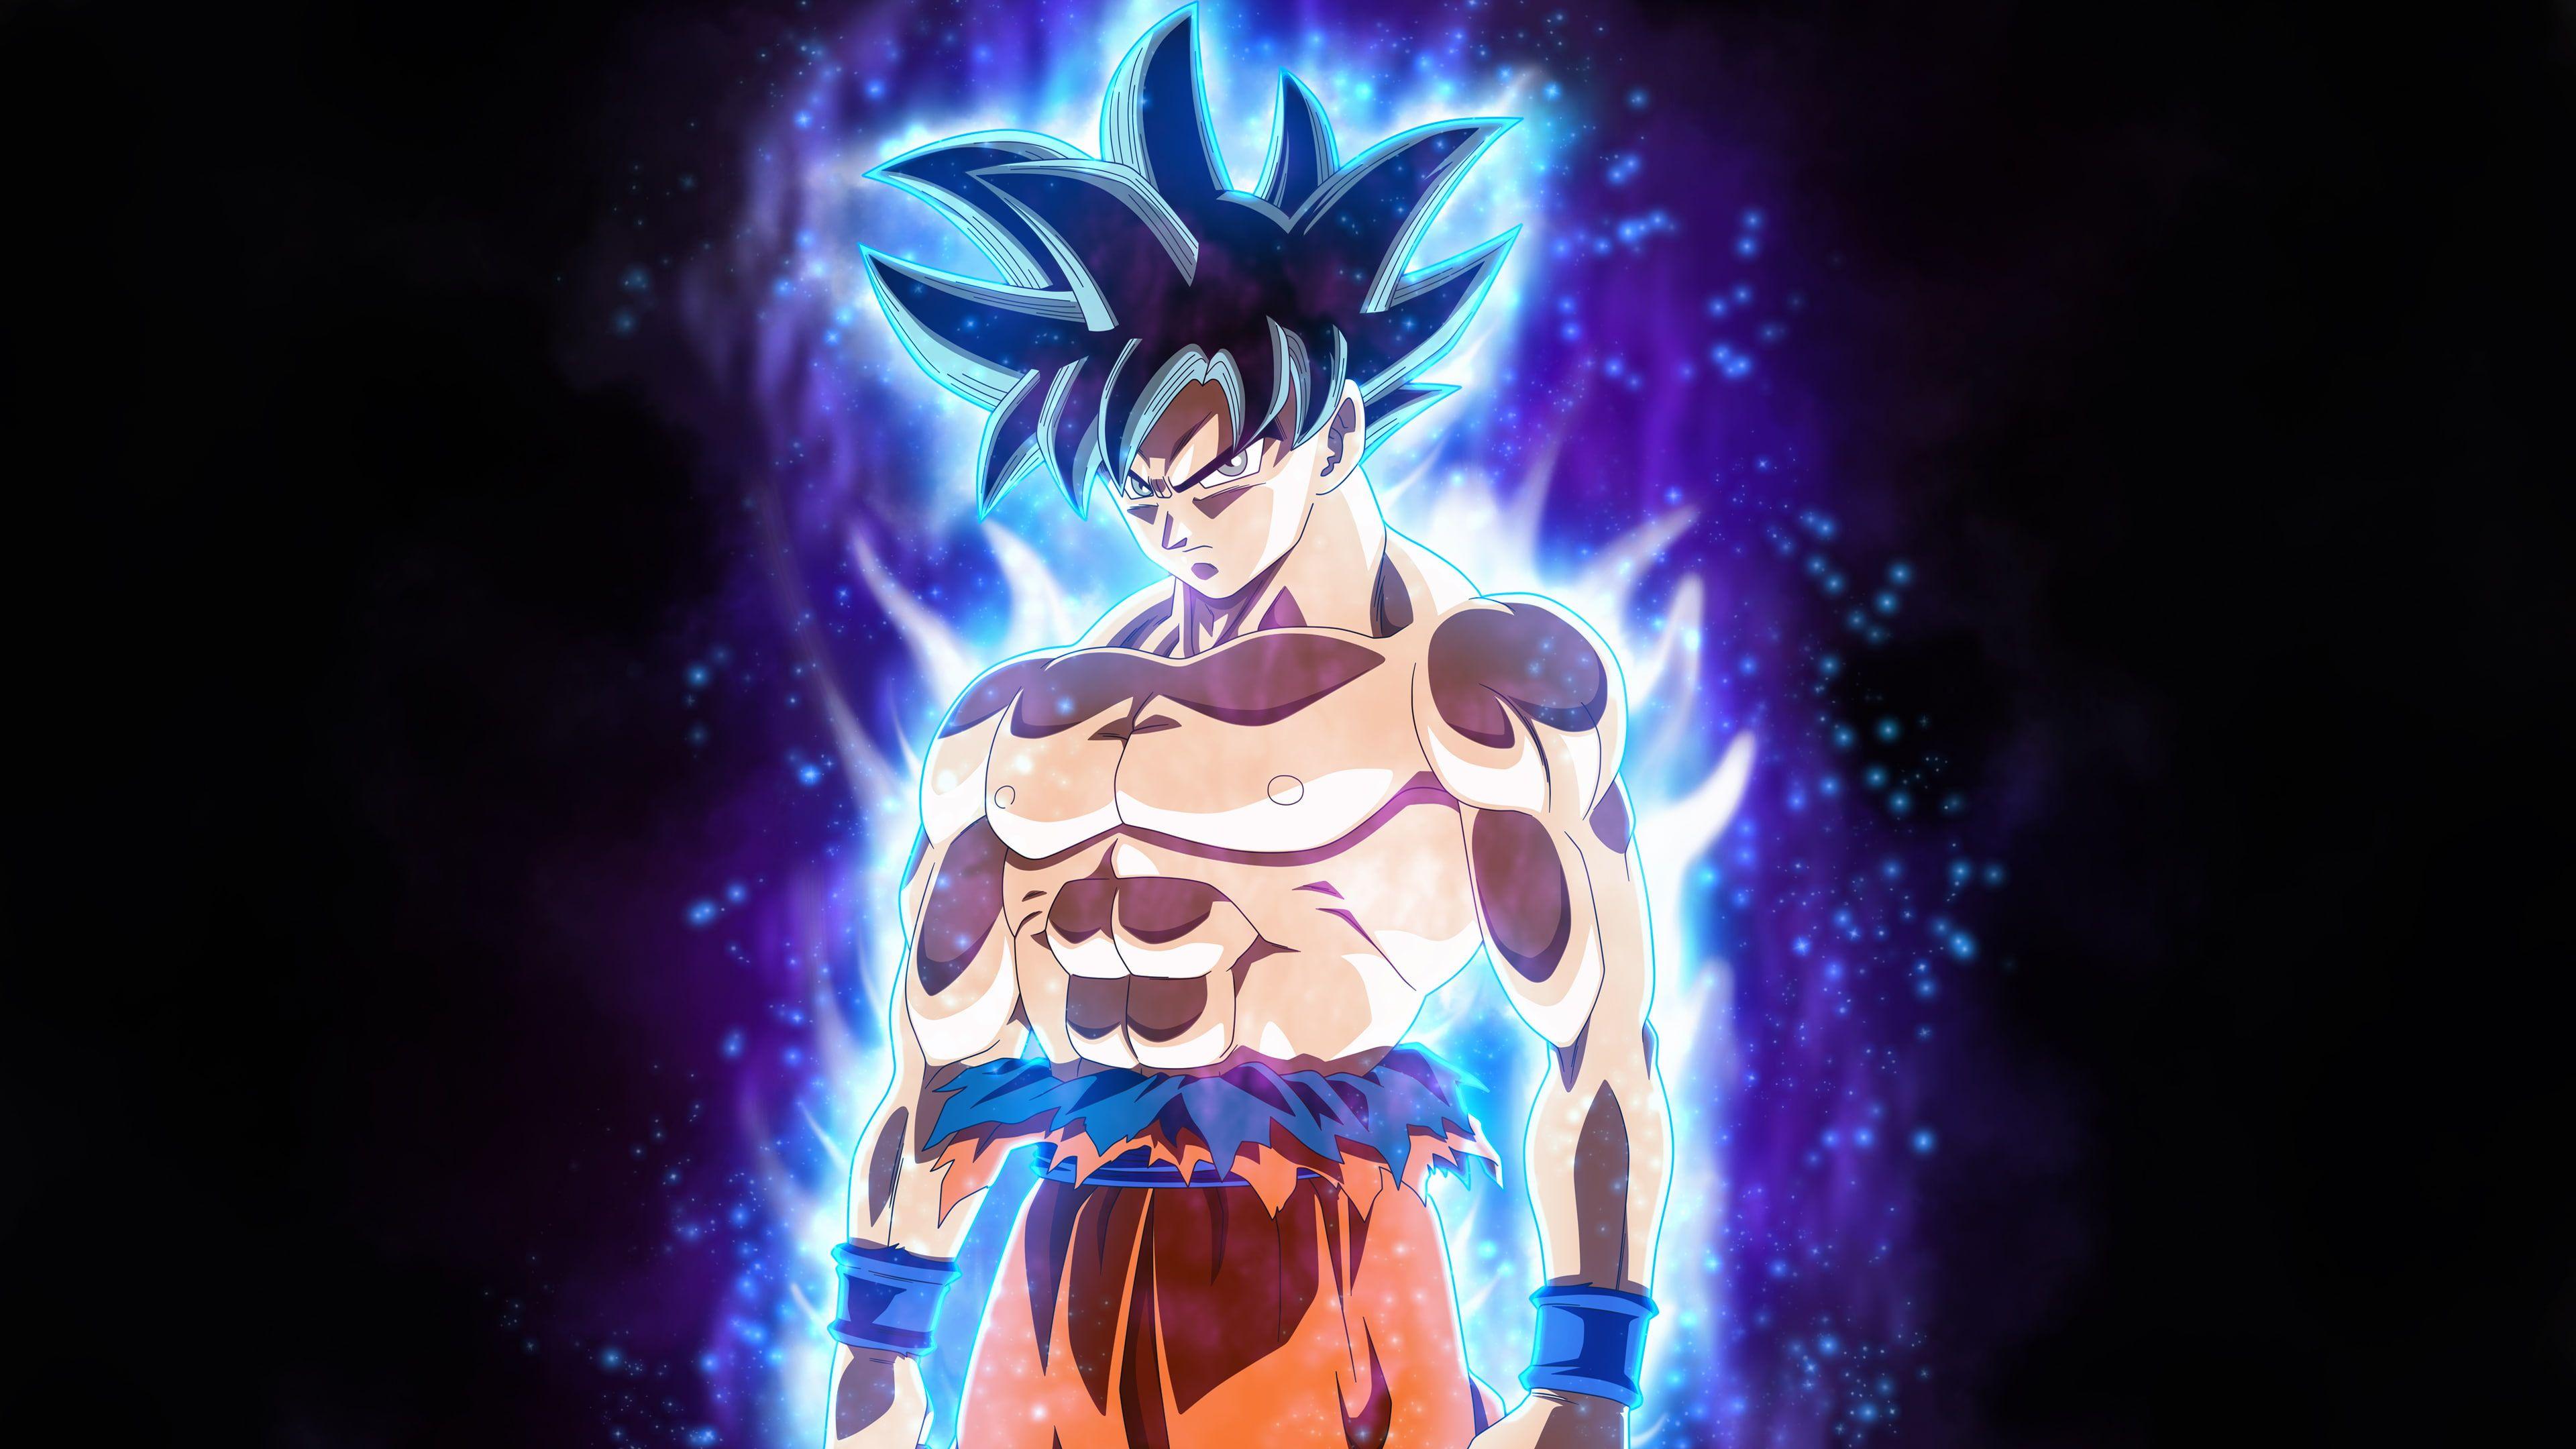 Goku Ultra Instinct Wallpaper 4k Mobile